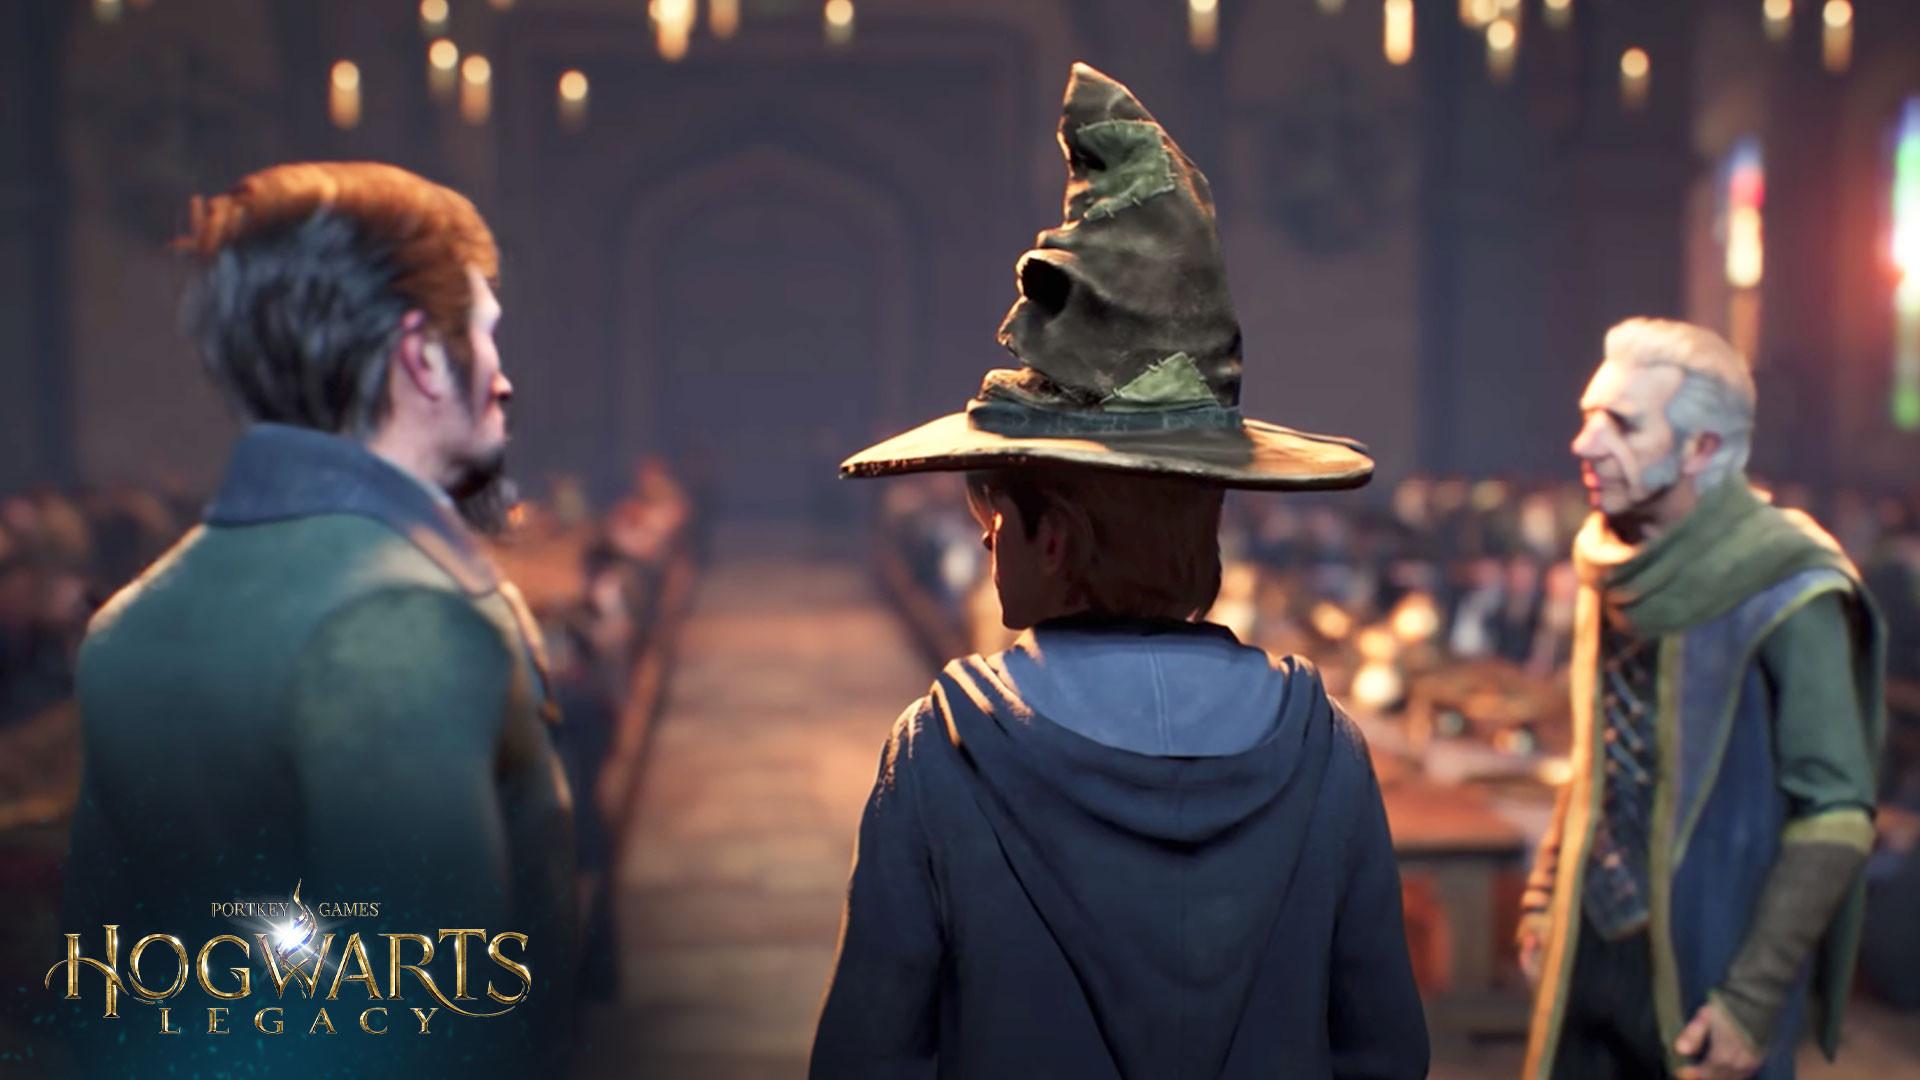 Hogwarts_Legacy_Ben_Simonsen.jpg